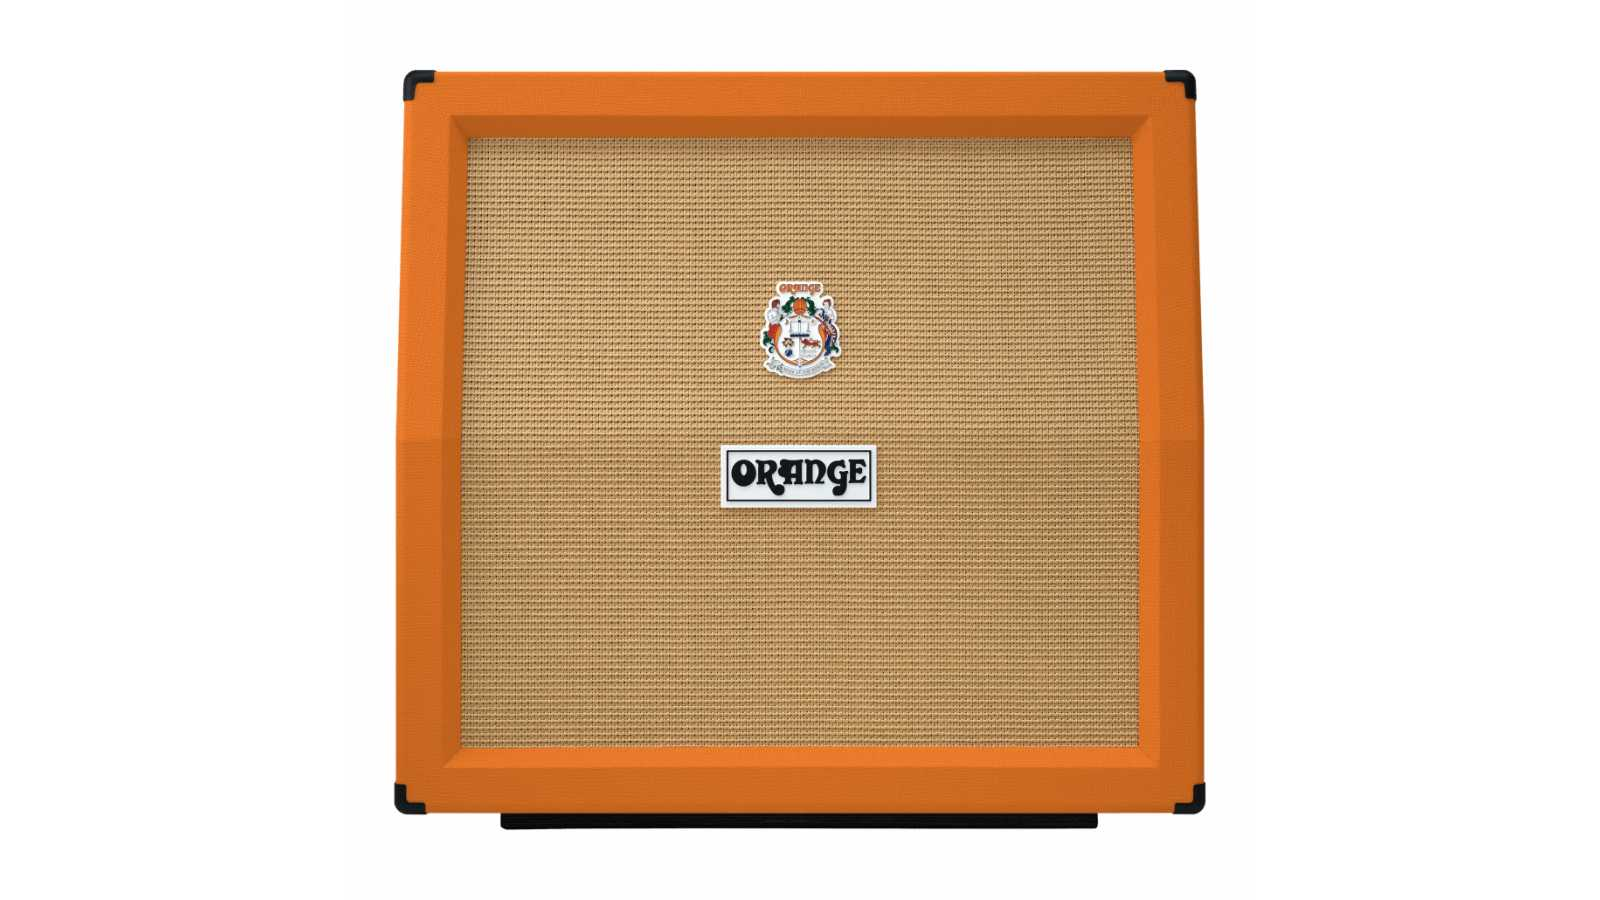 Orange PPC412AD Box Slope schräg